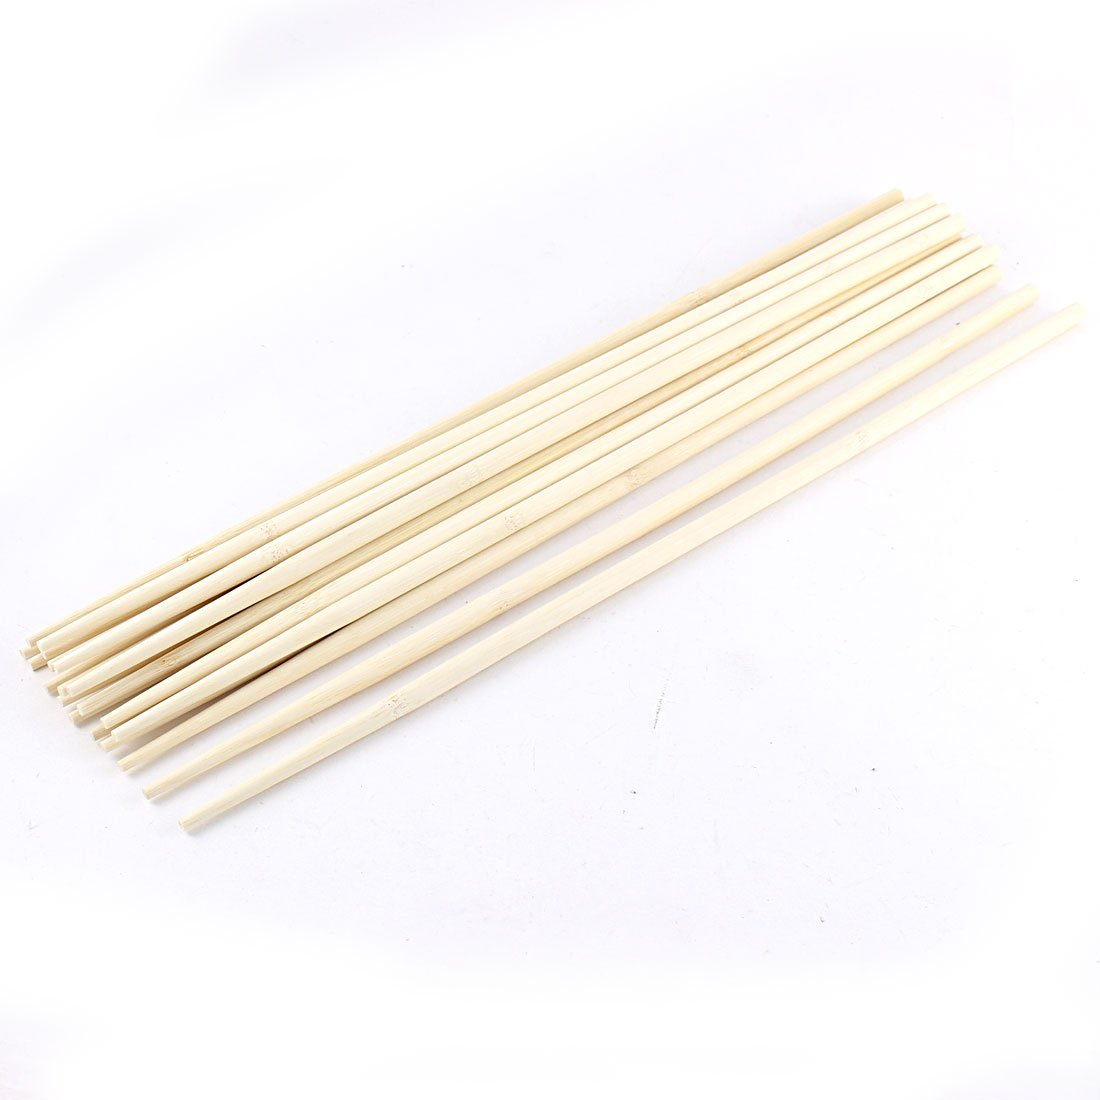 uxcell Kitchen Hot Pot Cooking Wooden Noodles Chopsticks 45cm Length 10 Pairs a16010500ux2856